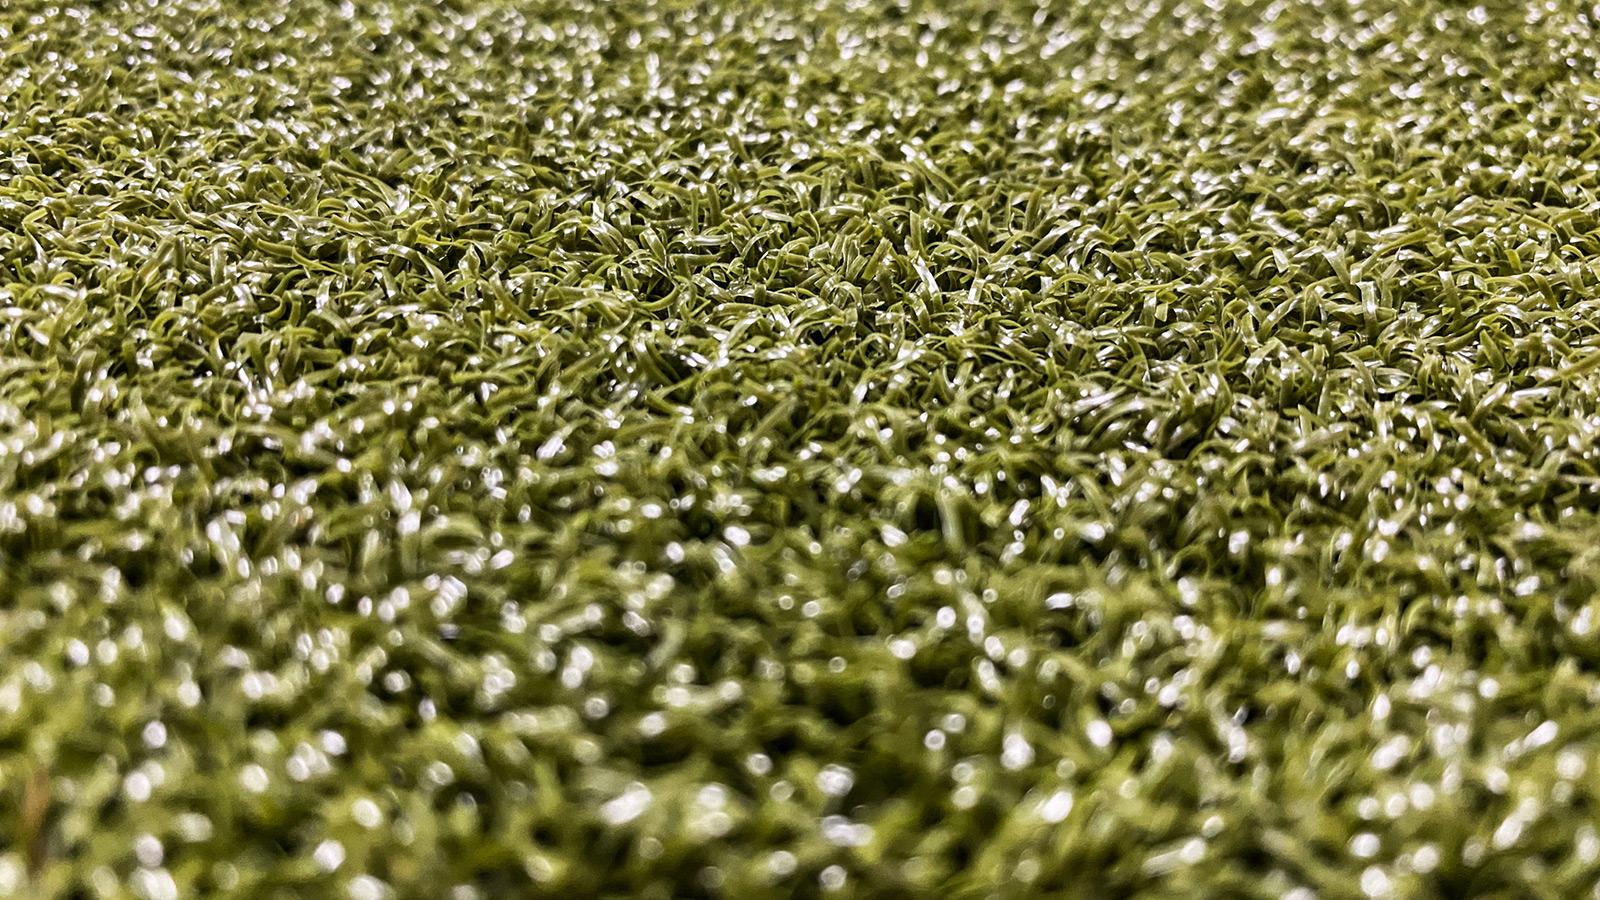 Putt Nylon Side | Artificial Grass | Eco-Friendly Turf Flooring | The Inside Track